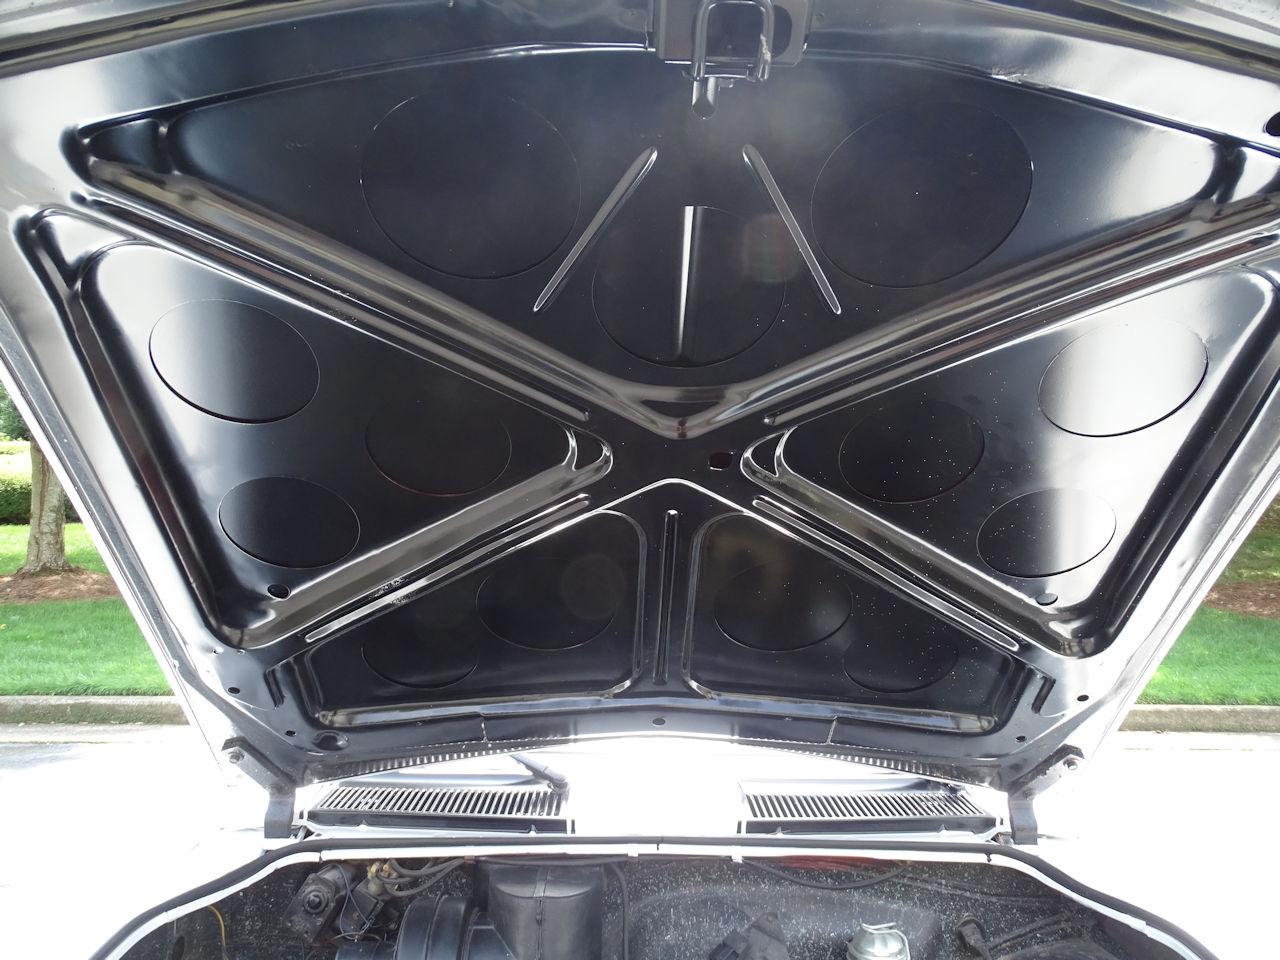 1966 Chevrolet Corvair 91